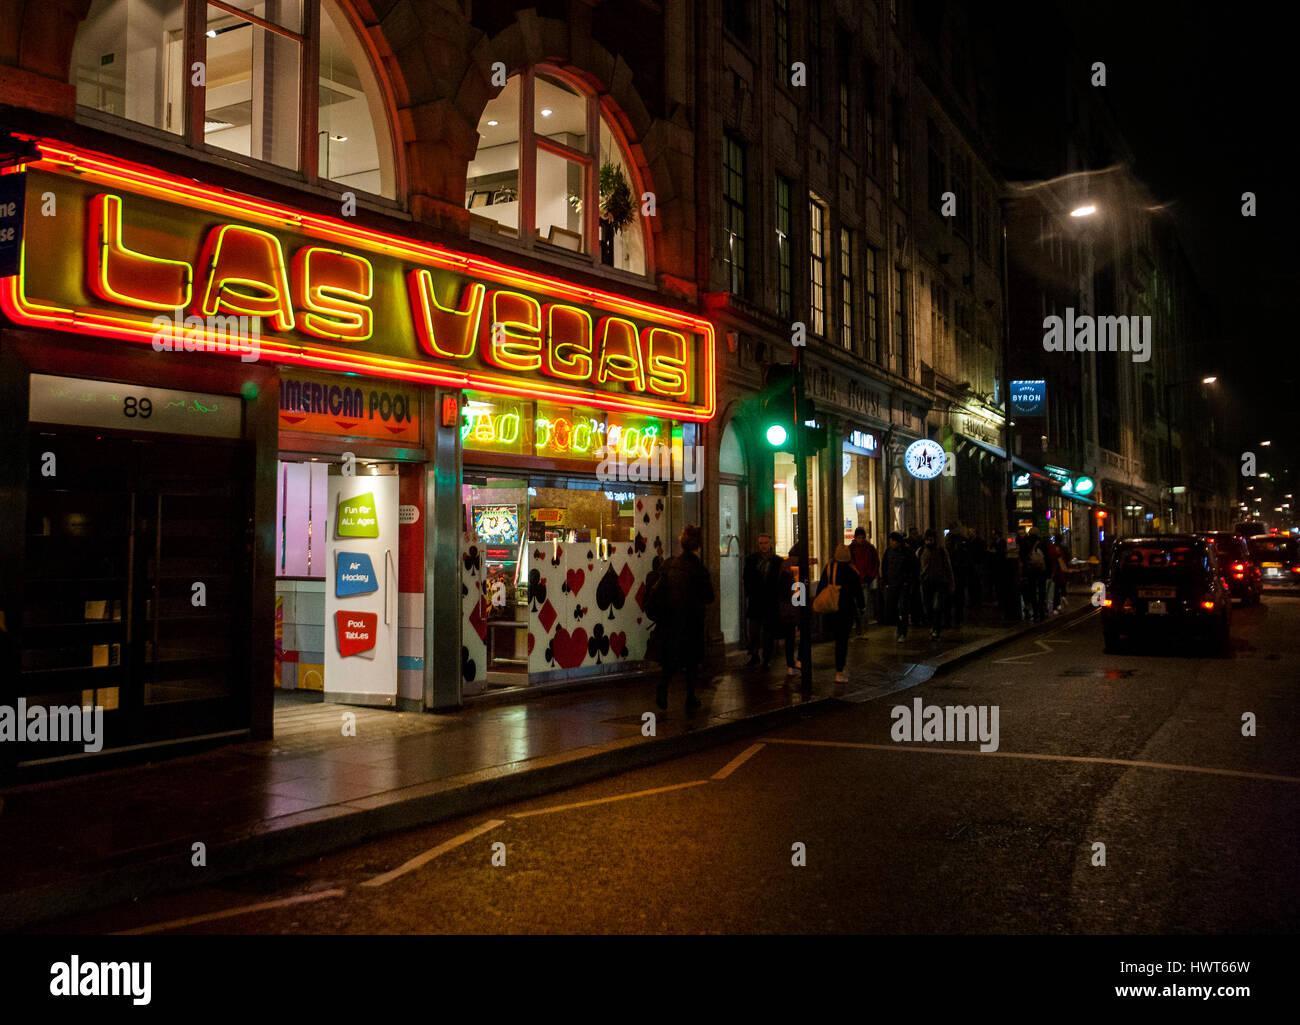 Las Vegas amusement arcade, Wardour Street, Soho, London - Stock Image